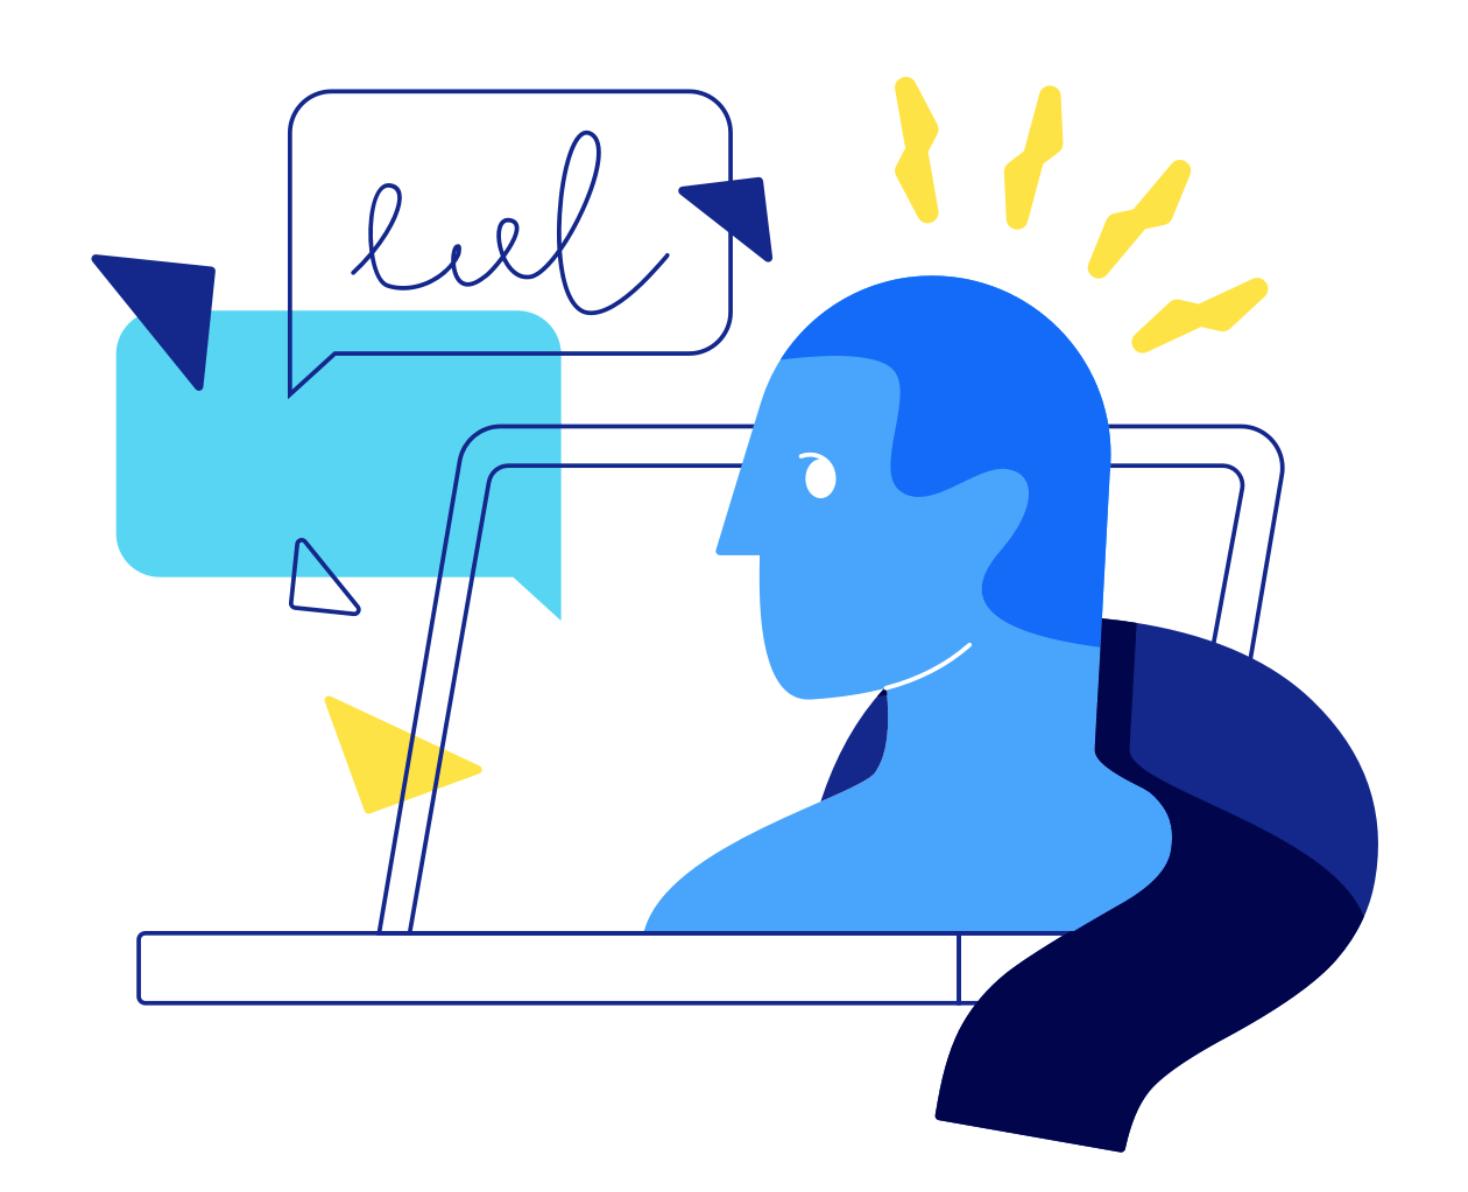 design storytelling through text